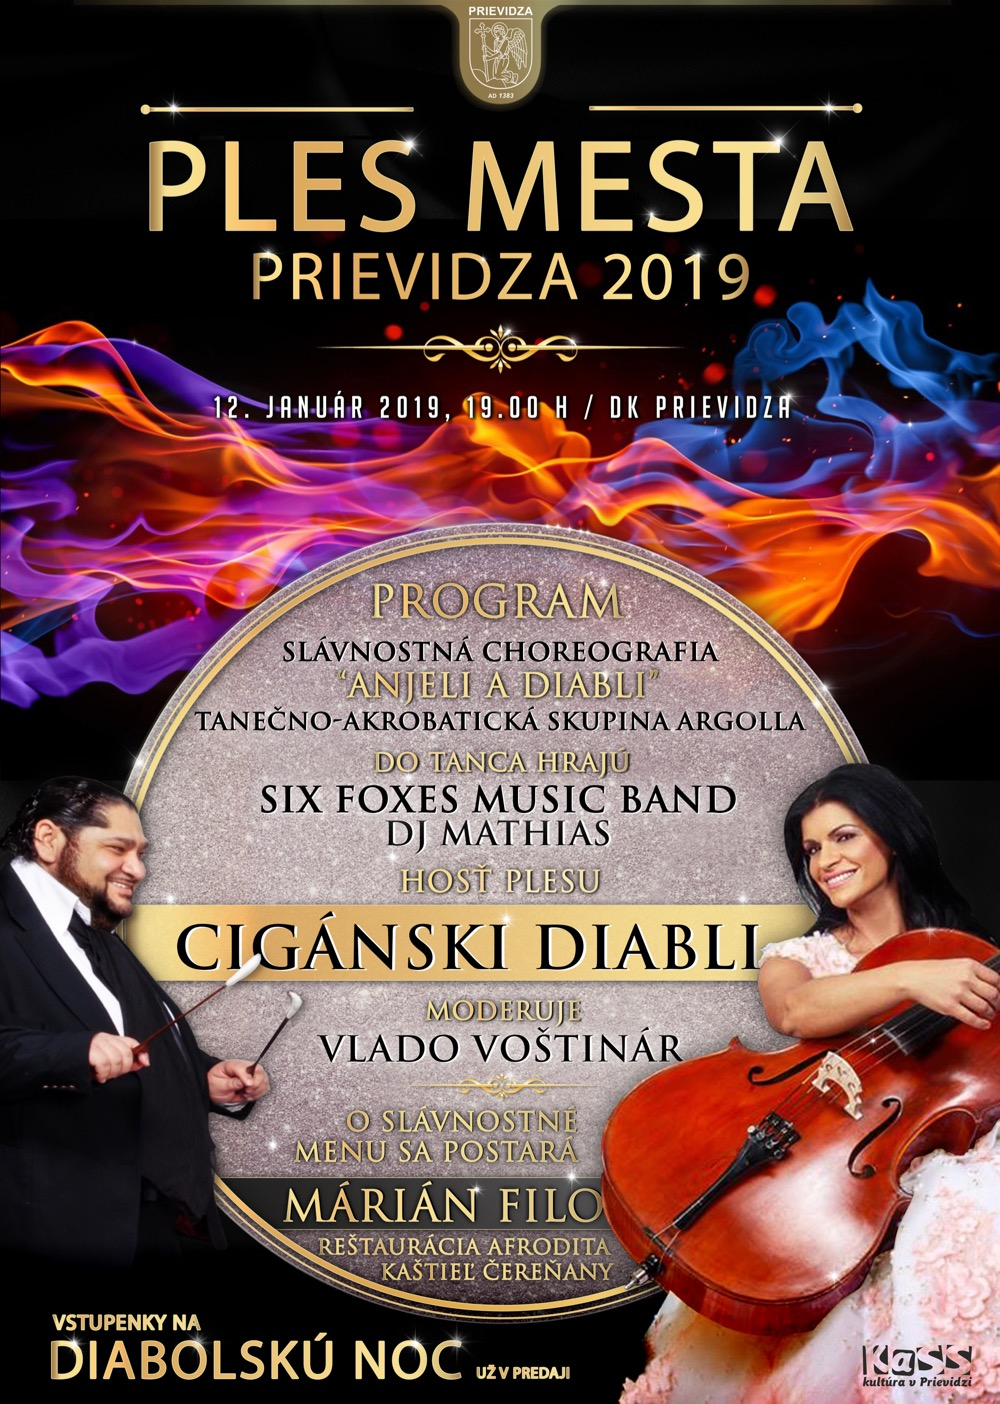 Ples mesta Prievidza 2019